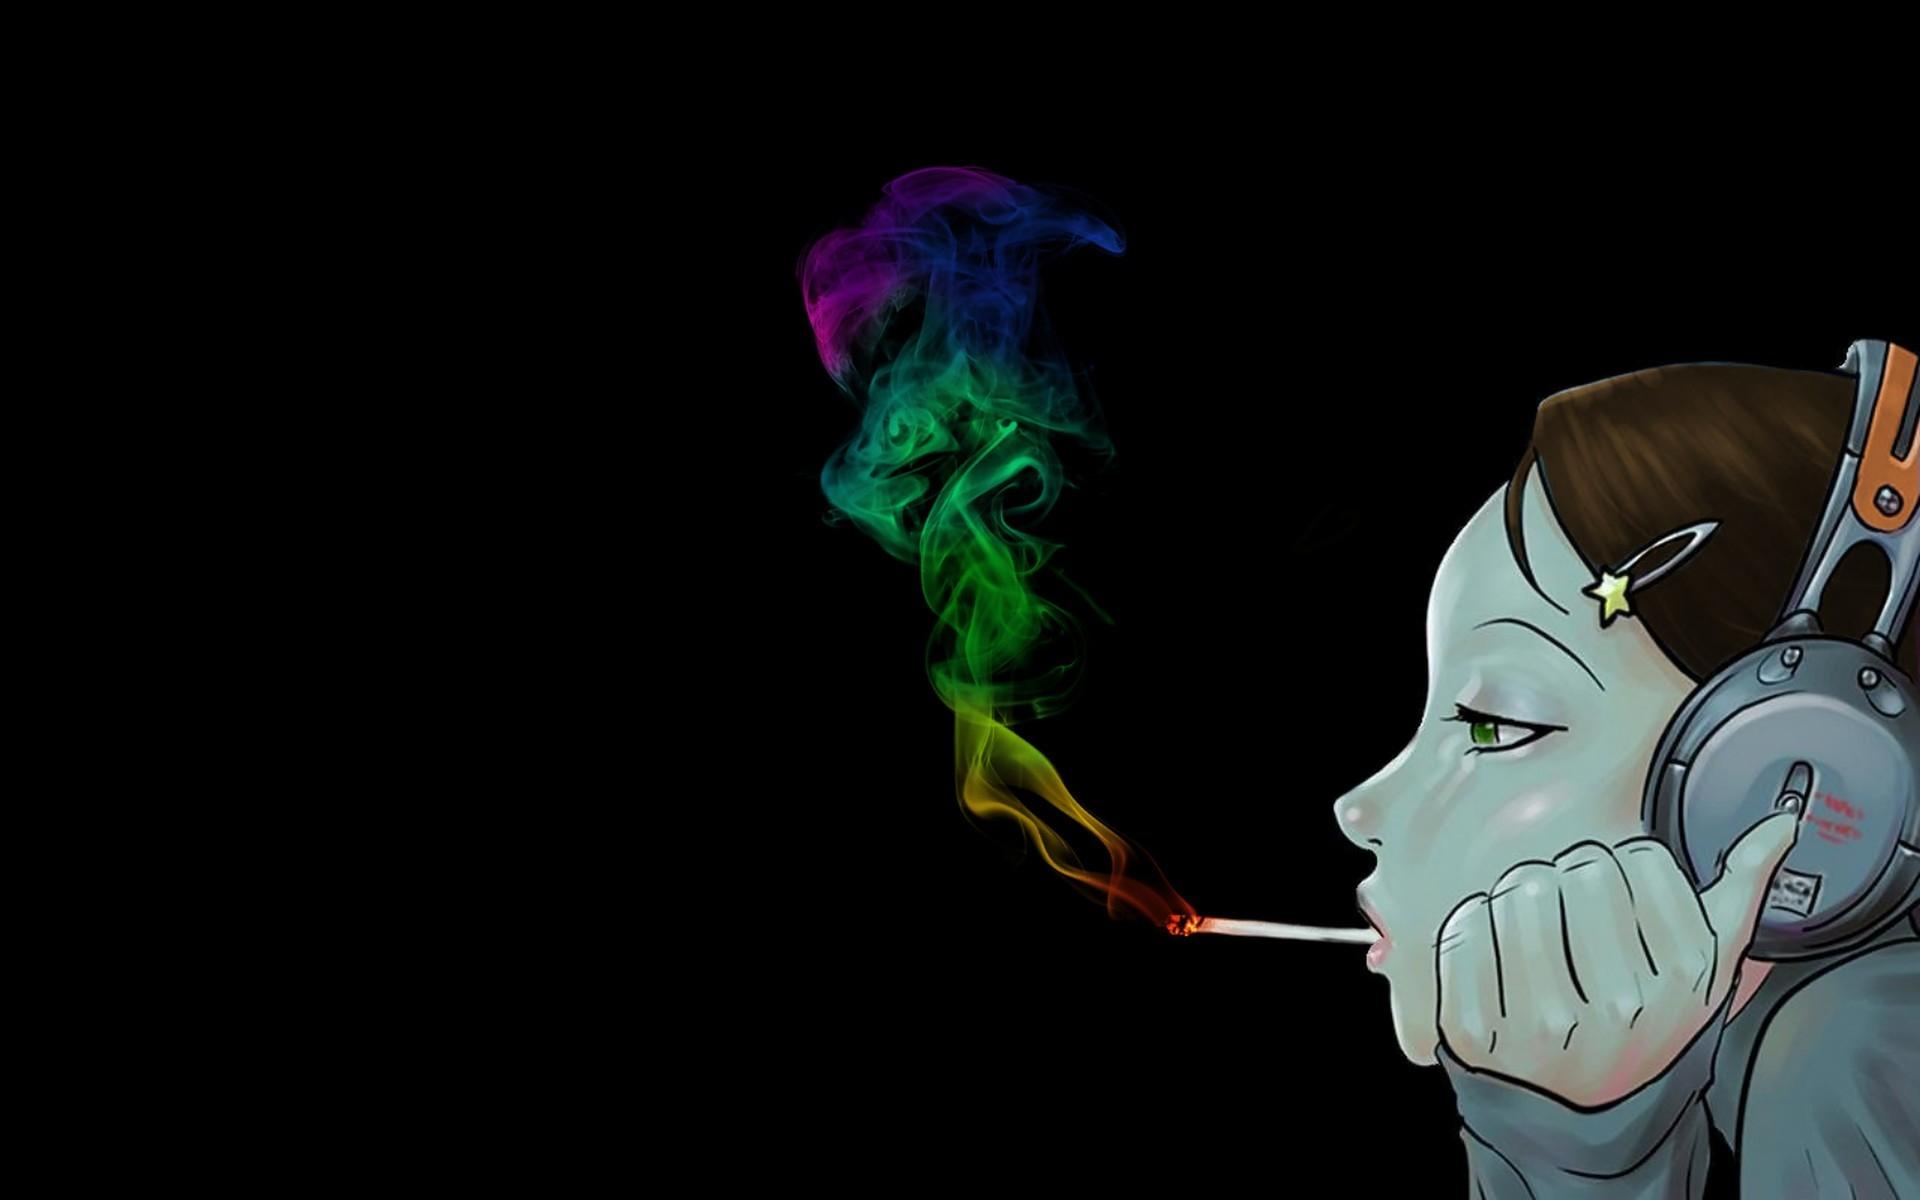 Wallpaper Girl Profile Headphones Cigarette Smoke Paint Mood 1920x1200 Wallup 1098256 Hd Wallpapers Wallhere